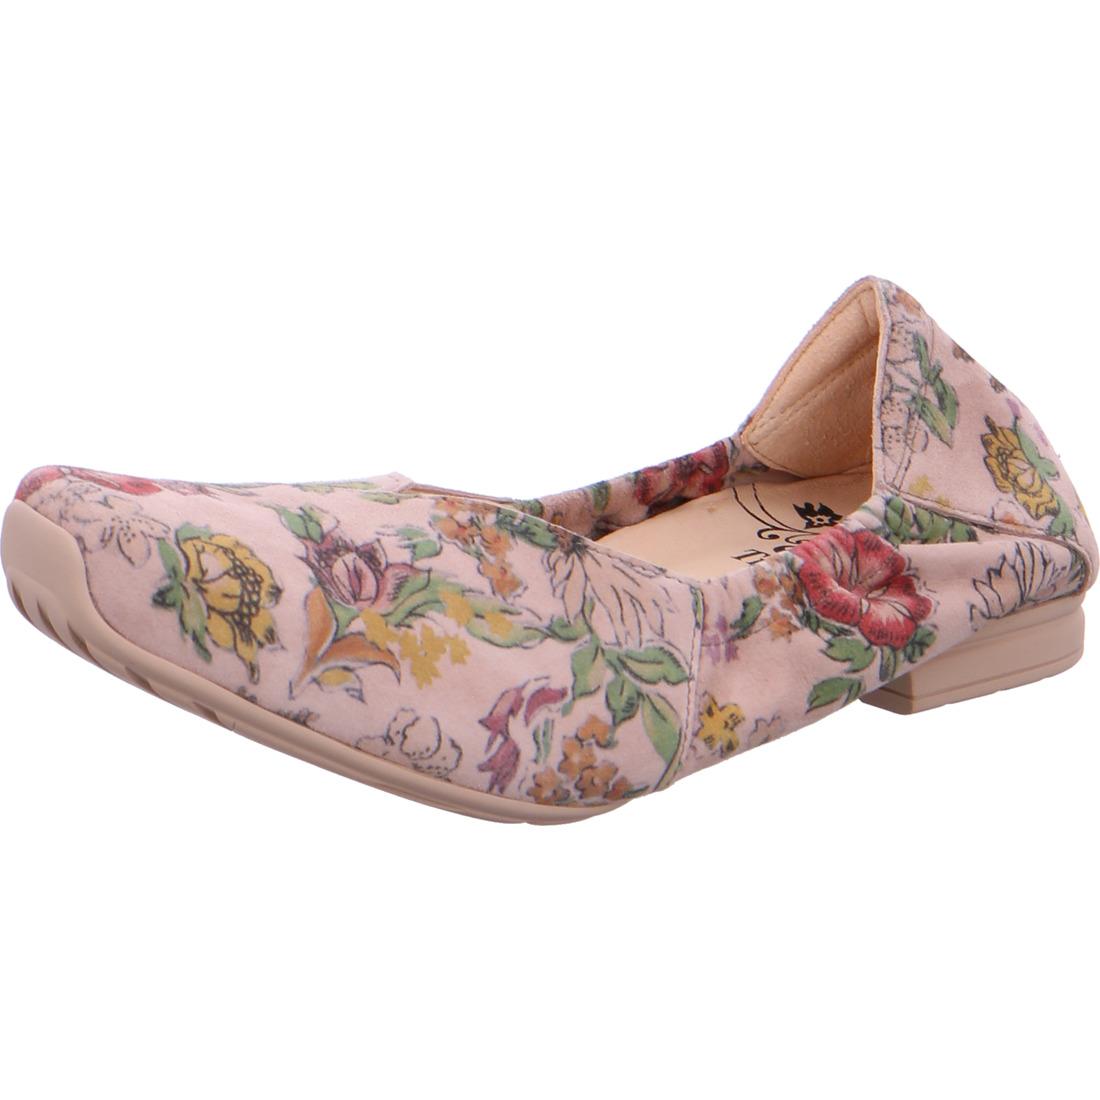 5498ea11cff278 Think Schuhe im Sale online bestellen